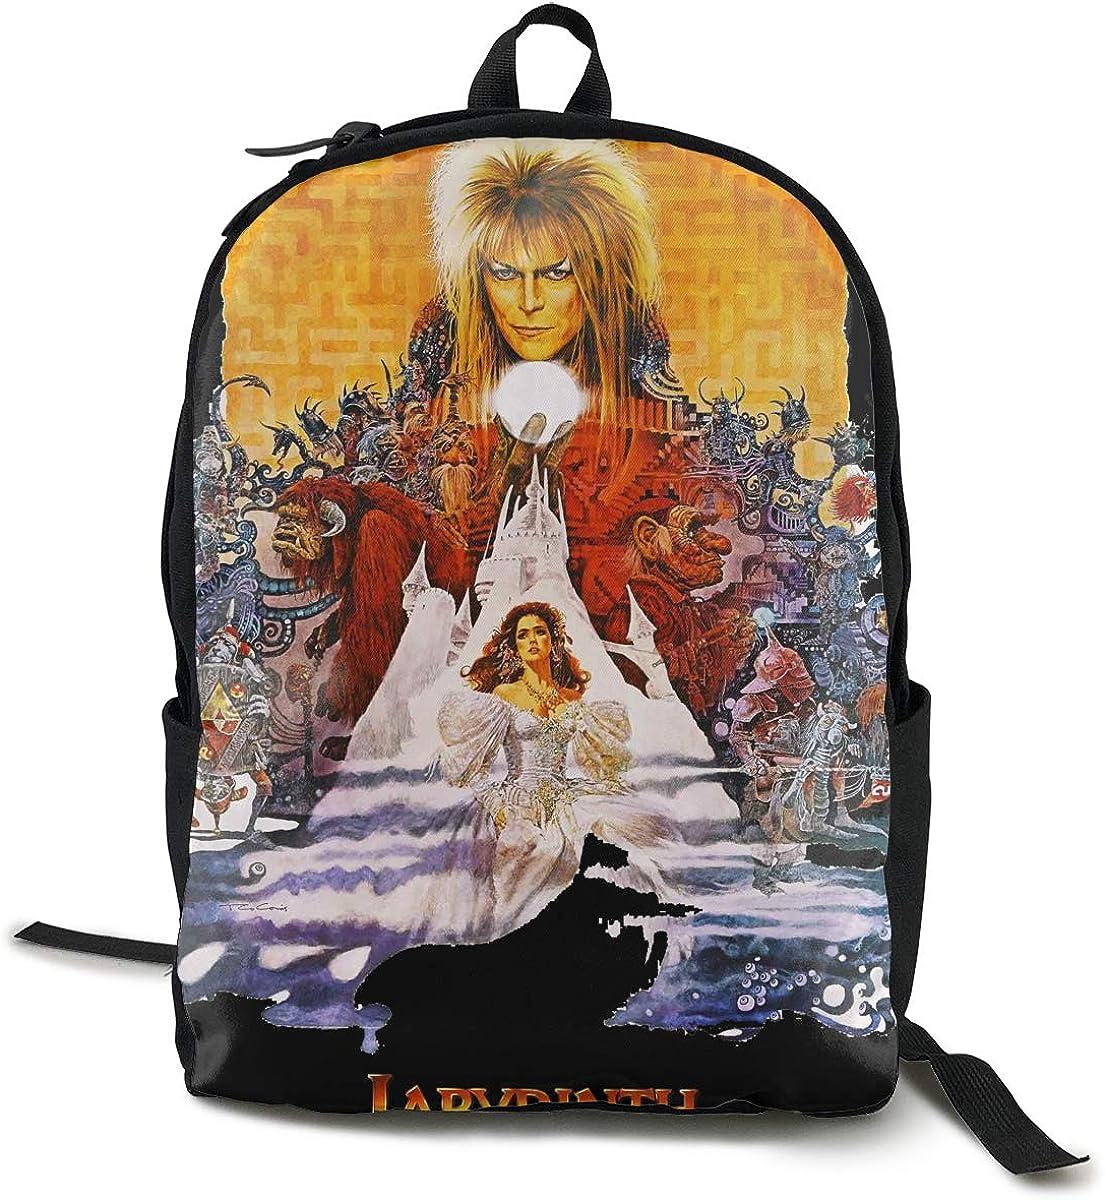 Stephan D Hampton Labyrinth 1986 Unisex Backpack Hiking Backpack Travel Sports Bag